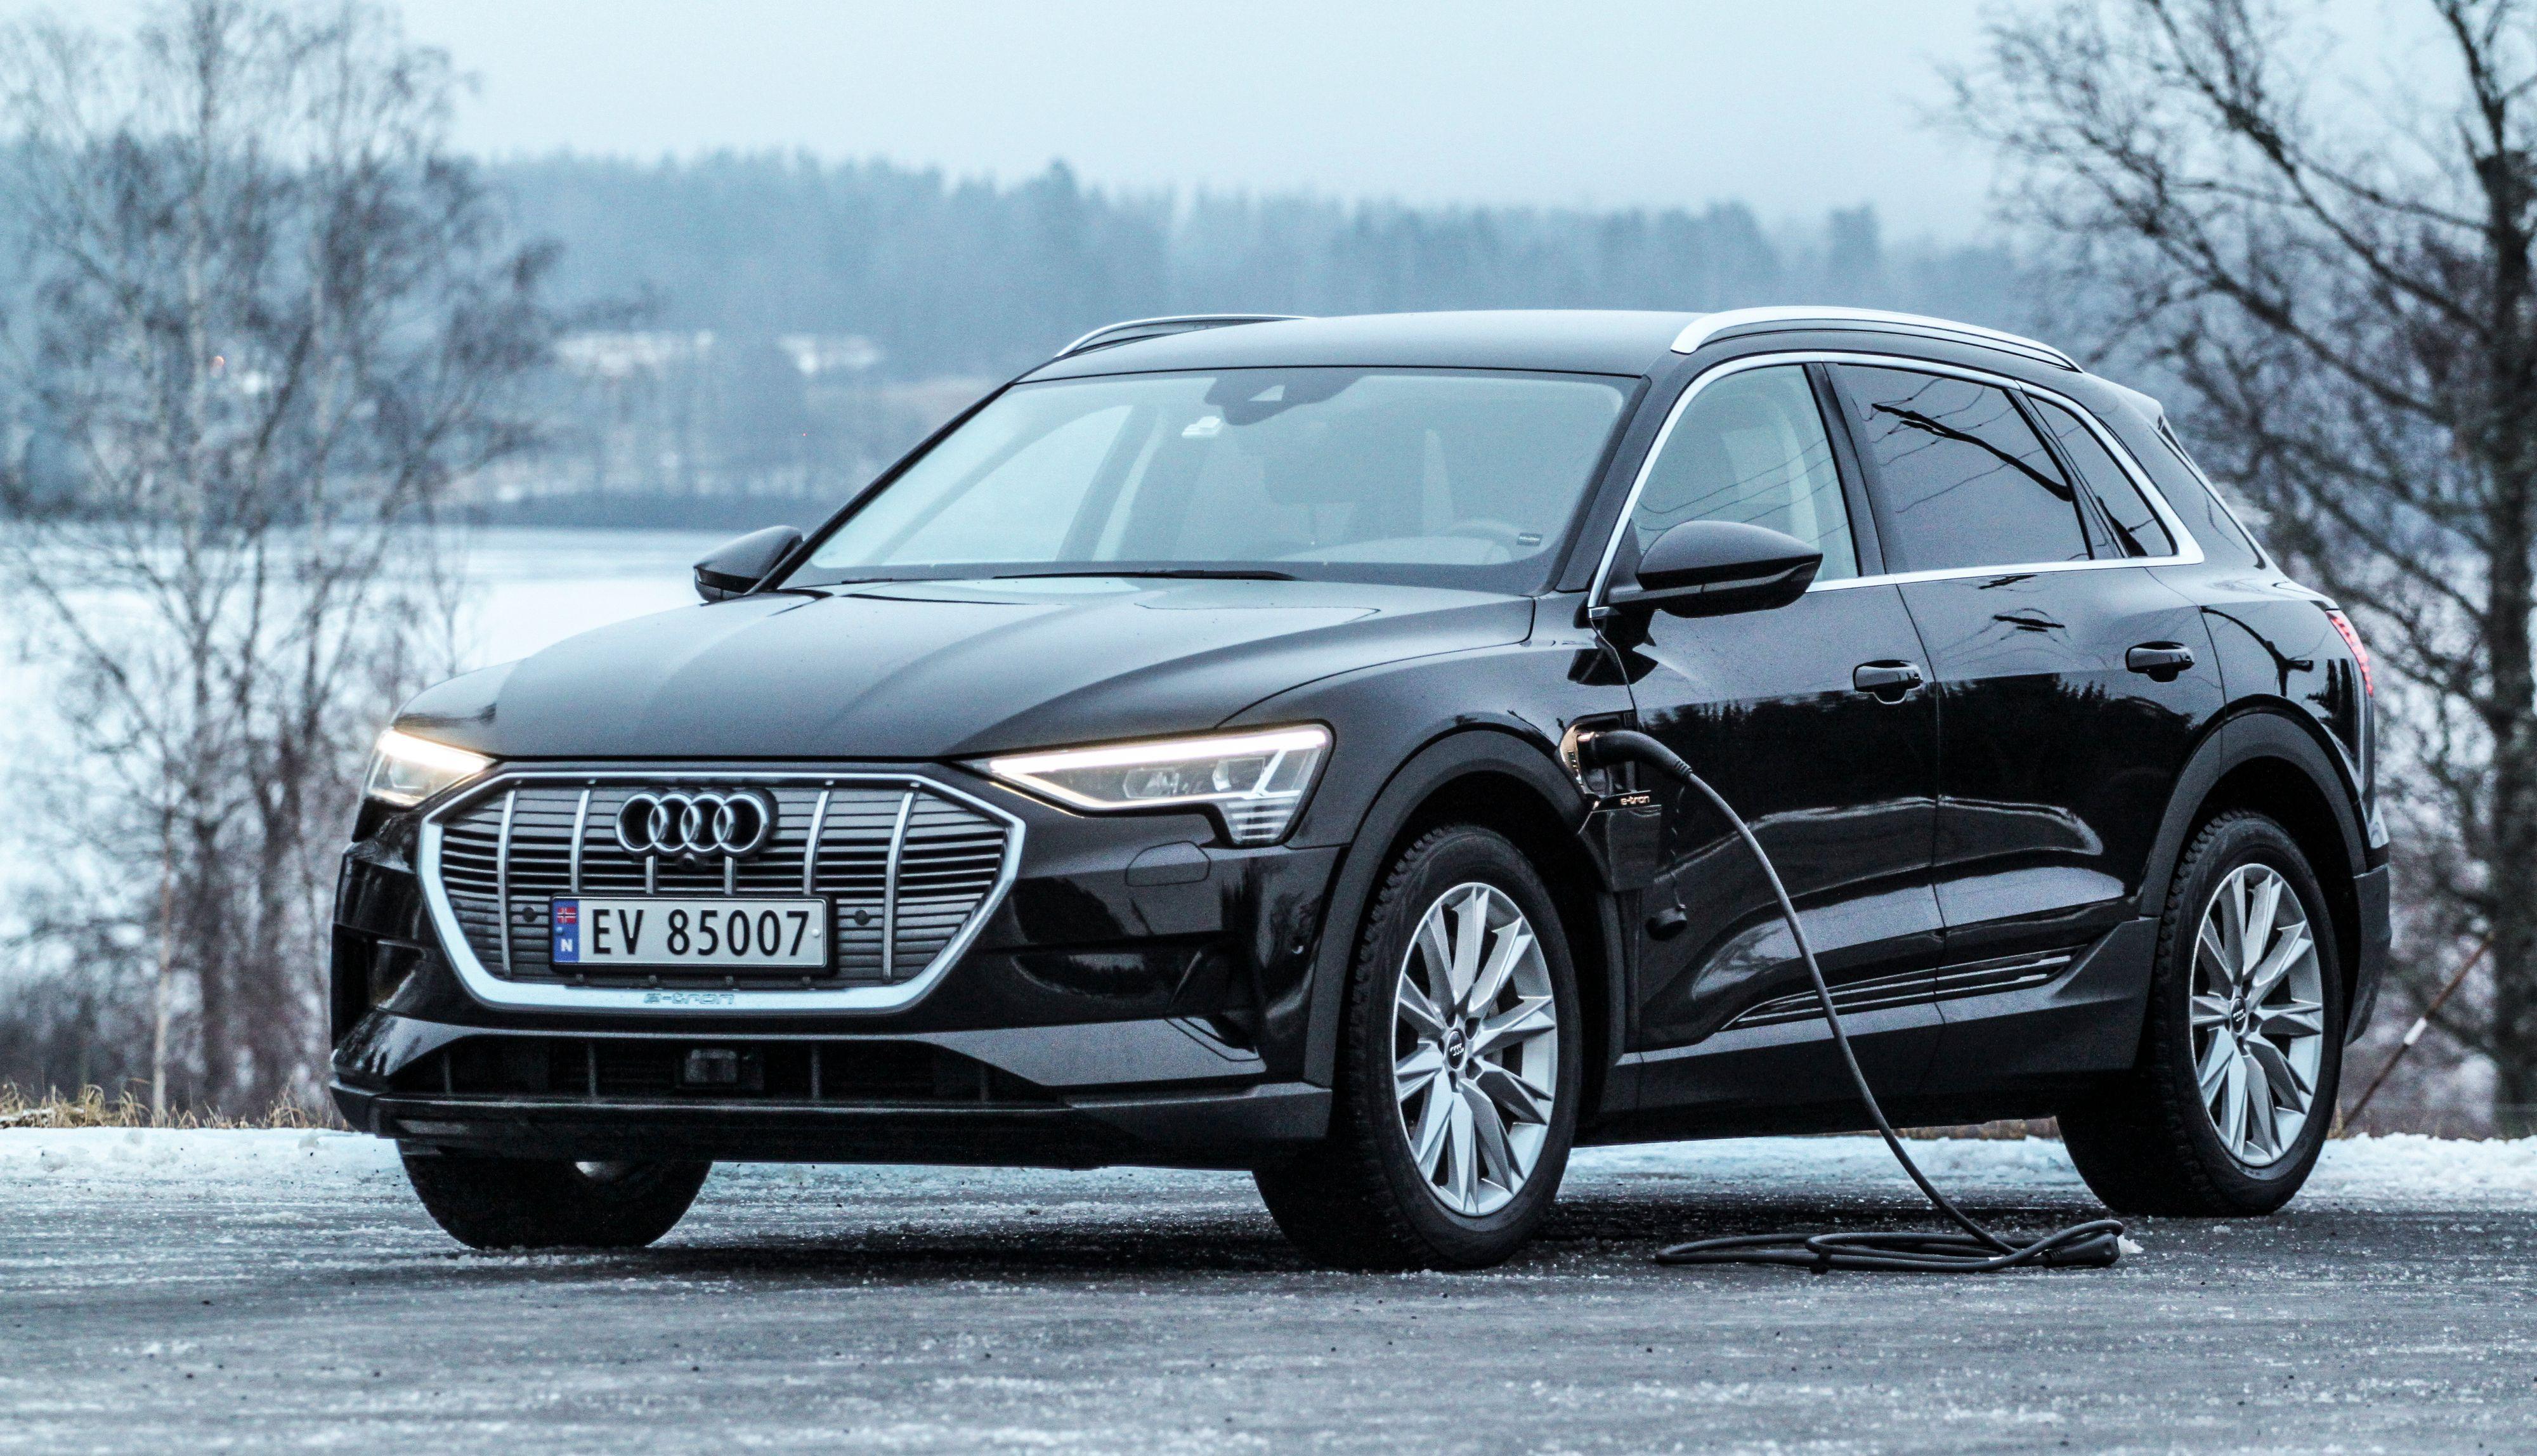 Audi e-tron troner øverst på salgsstatistikken for tredje måned på rad.